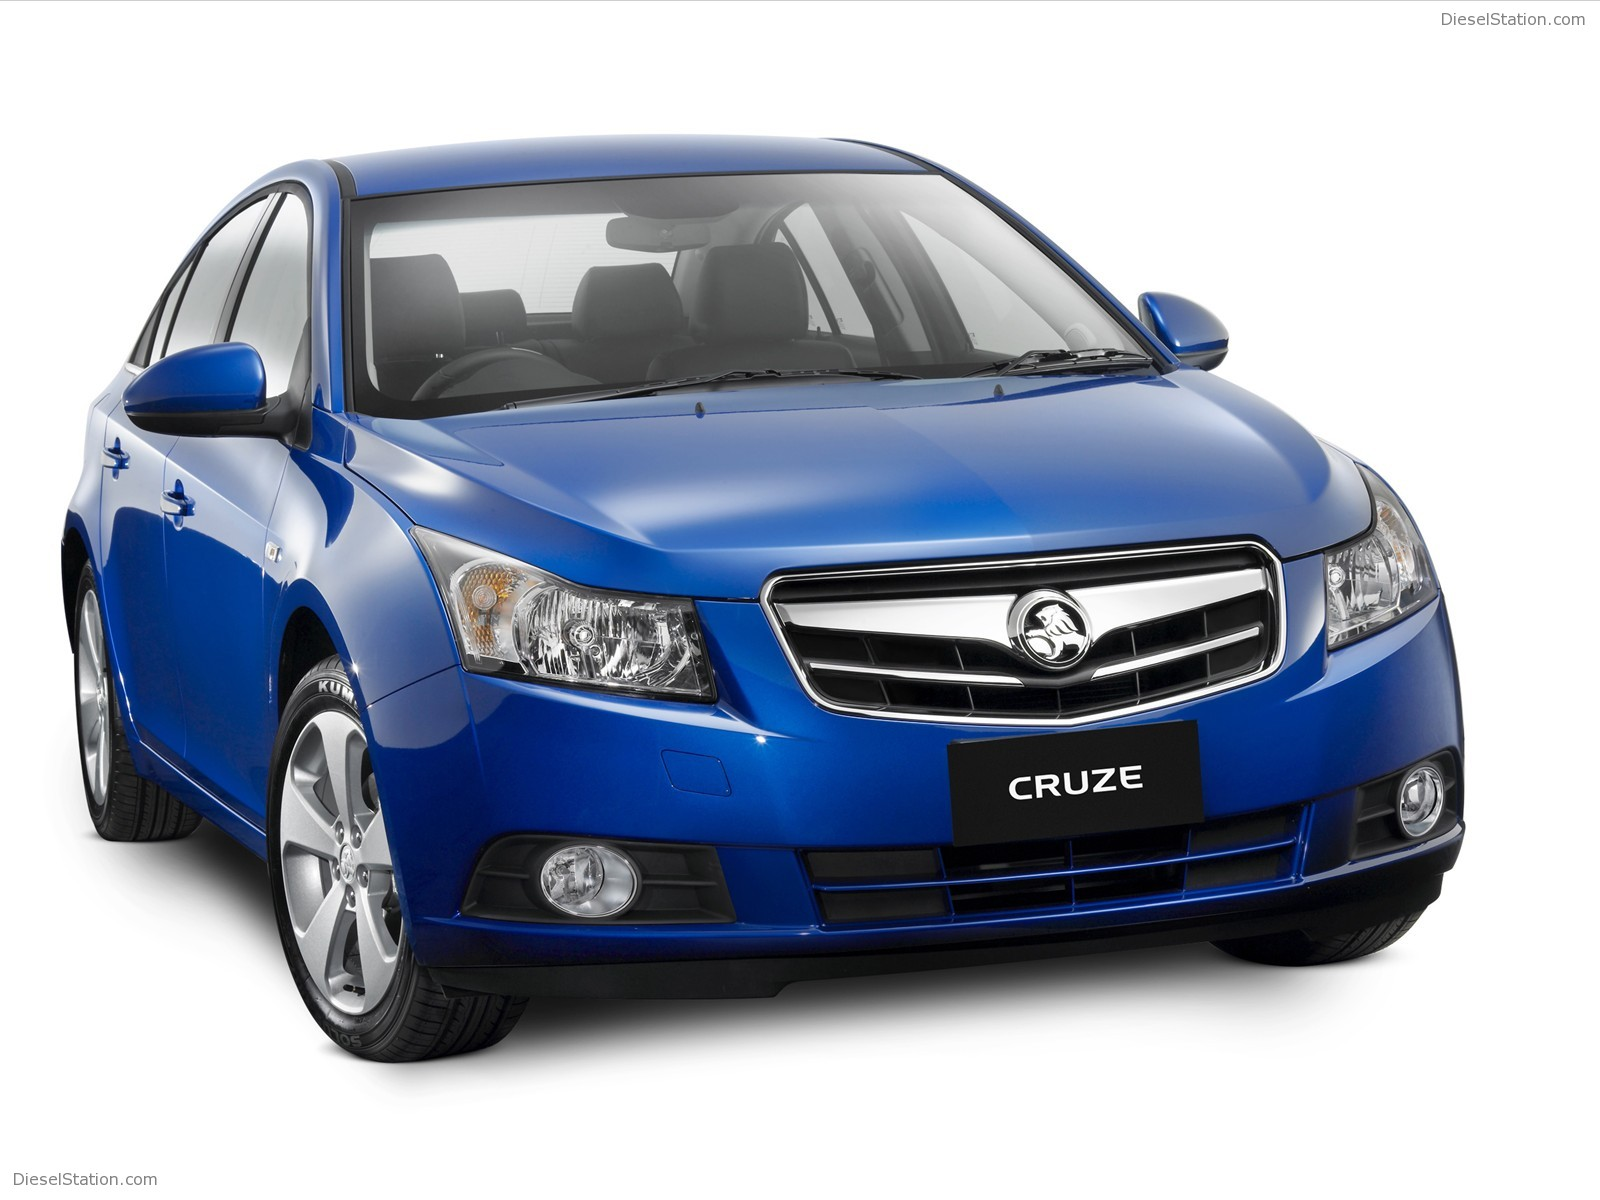 2010-Holden-Cruze-01